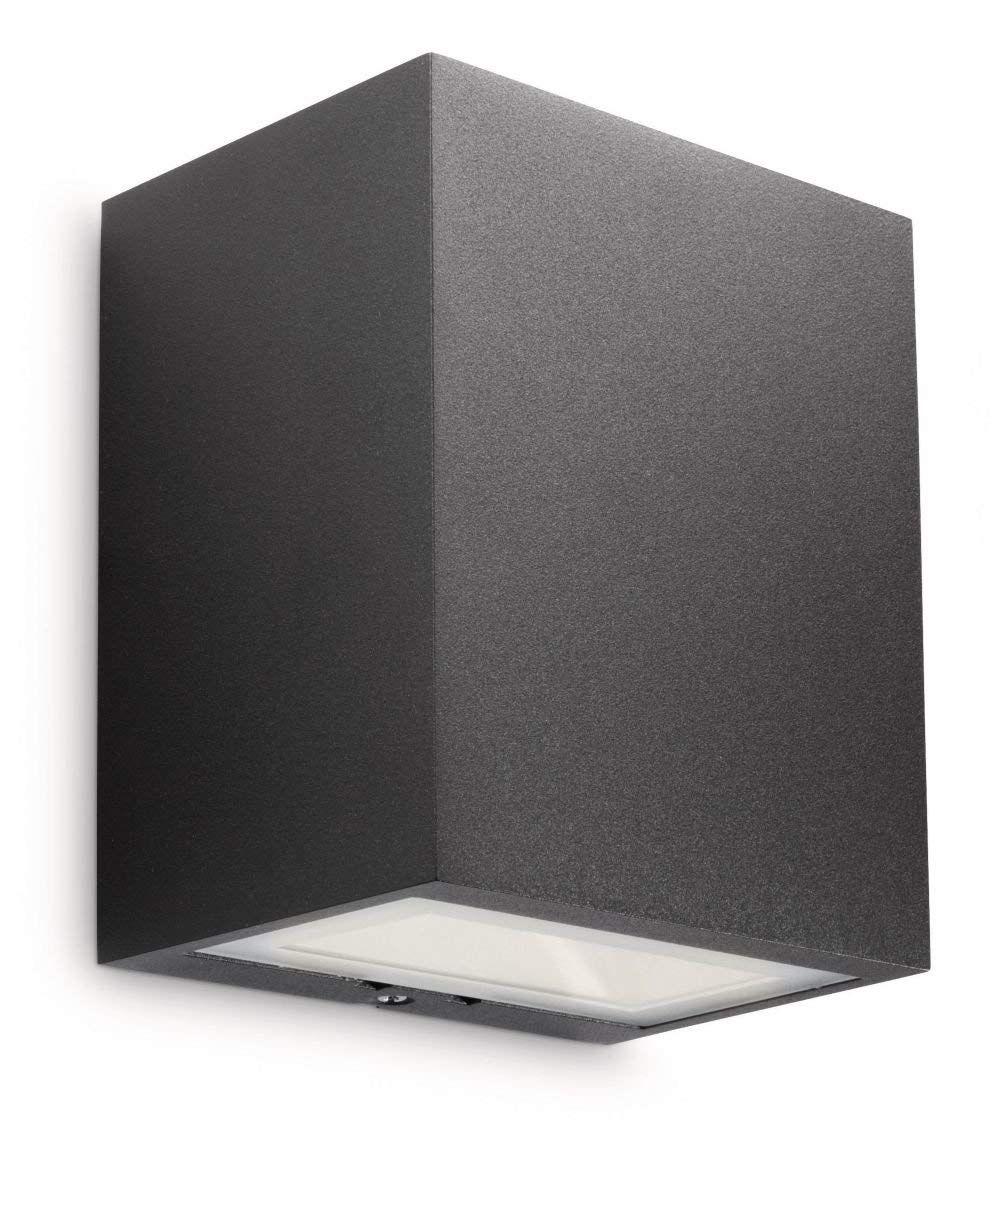 Philips Ledino Outdoor Flagstone Outdoor Wall Light Black Integrated 1 X 7 5 Watts Led Bulb Amazon Co Uk L Black Outdoor Wall Lights Wall Lantern Flagstone